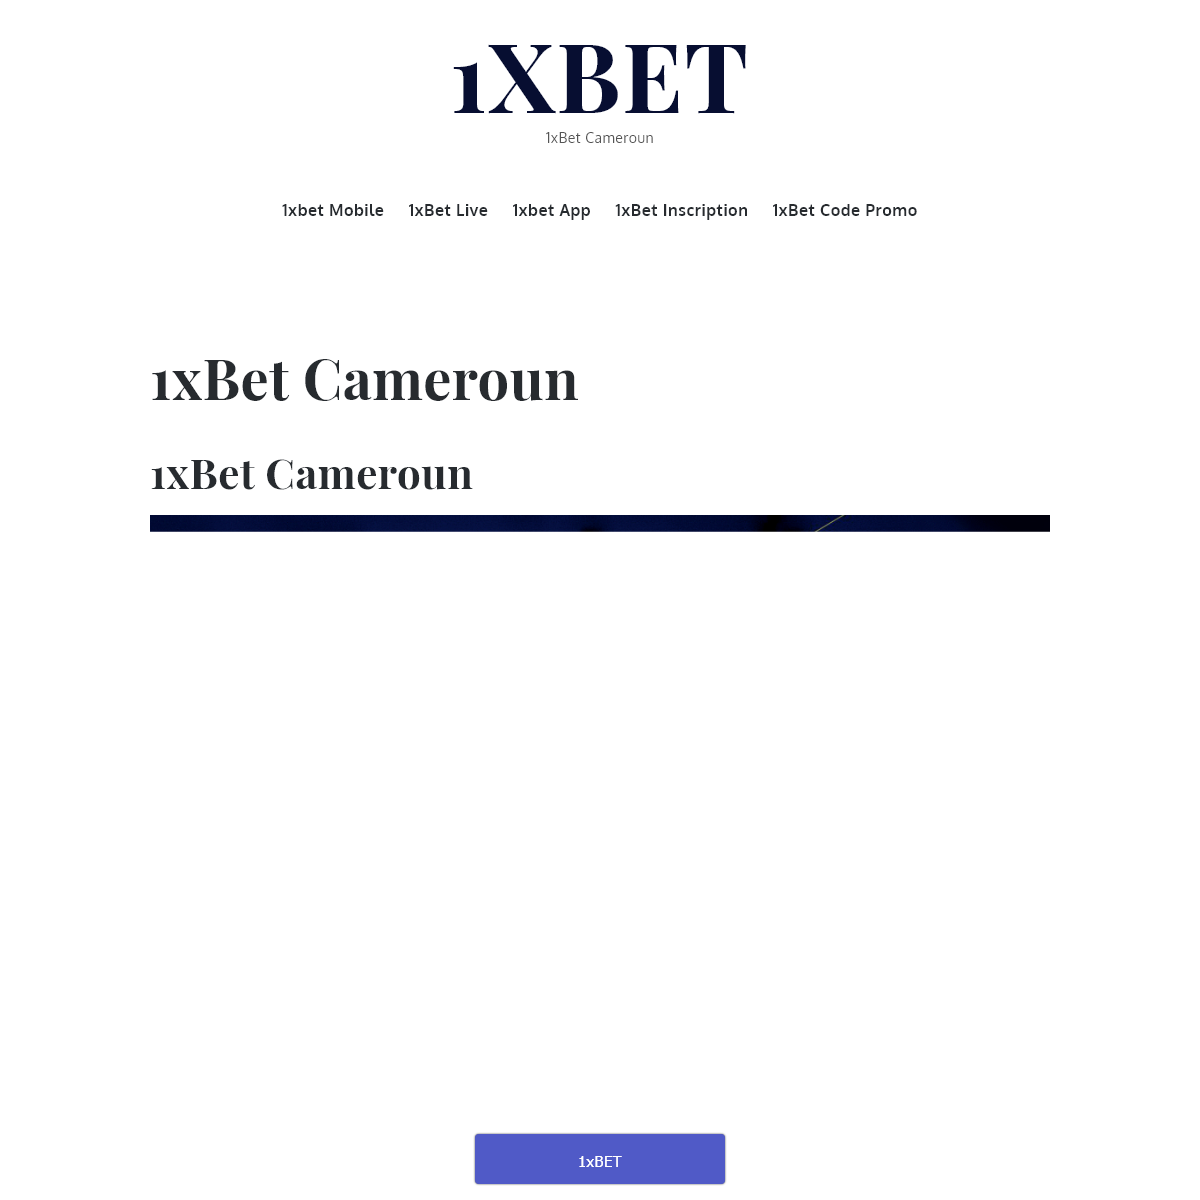 1xBet Cameroun - 1xBet Live, 1xBet Mobile, Paris sportifs - 1xBet Cameroon - 1xbet cm